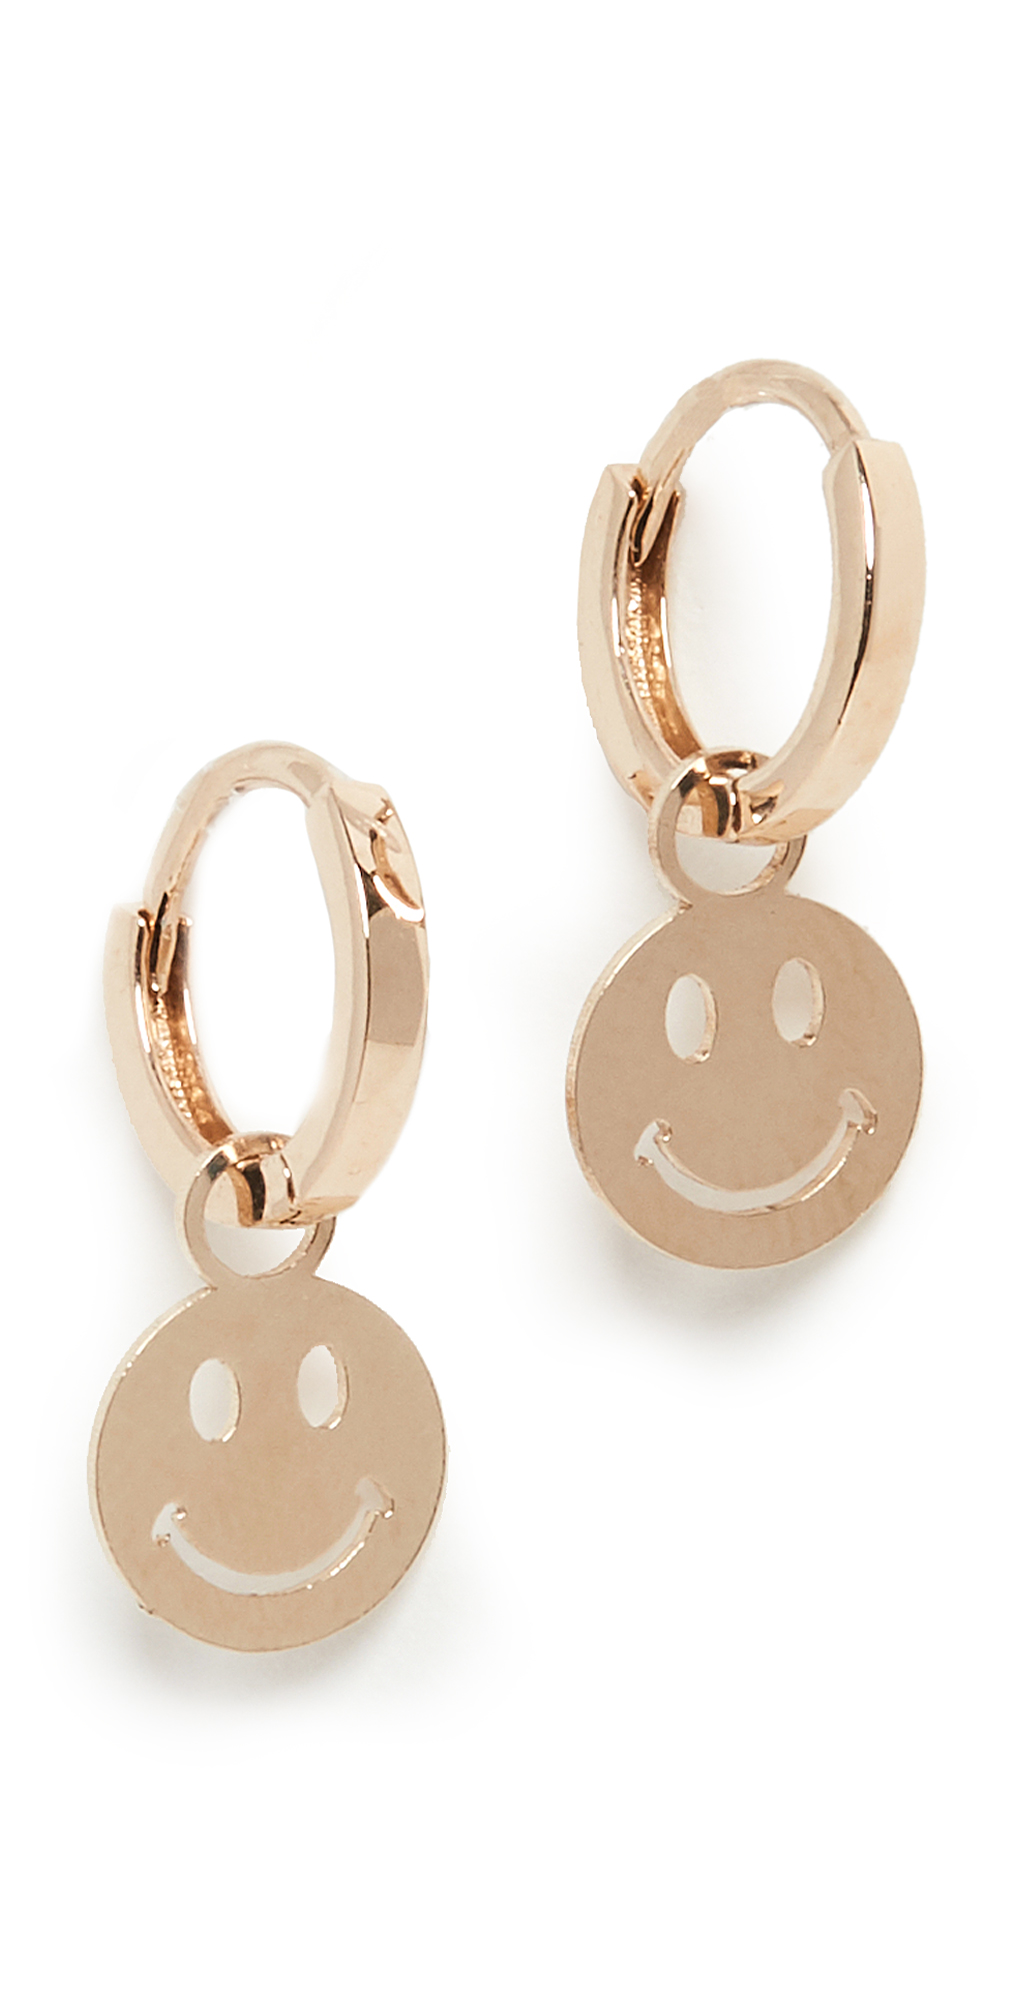 14k Smile Charming Hoops